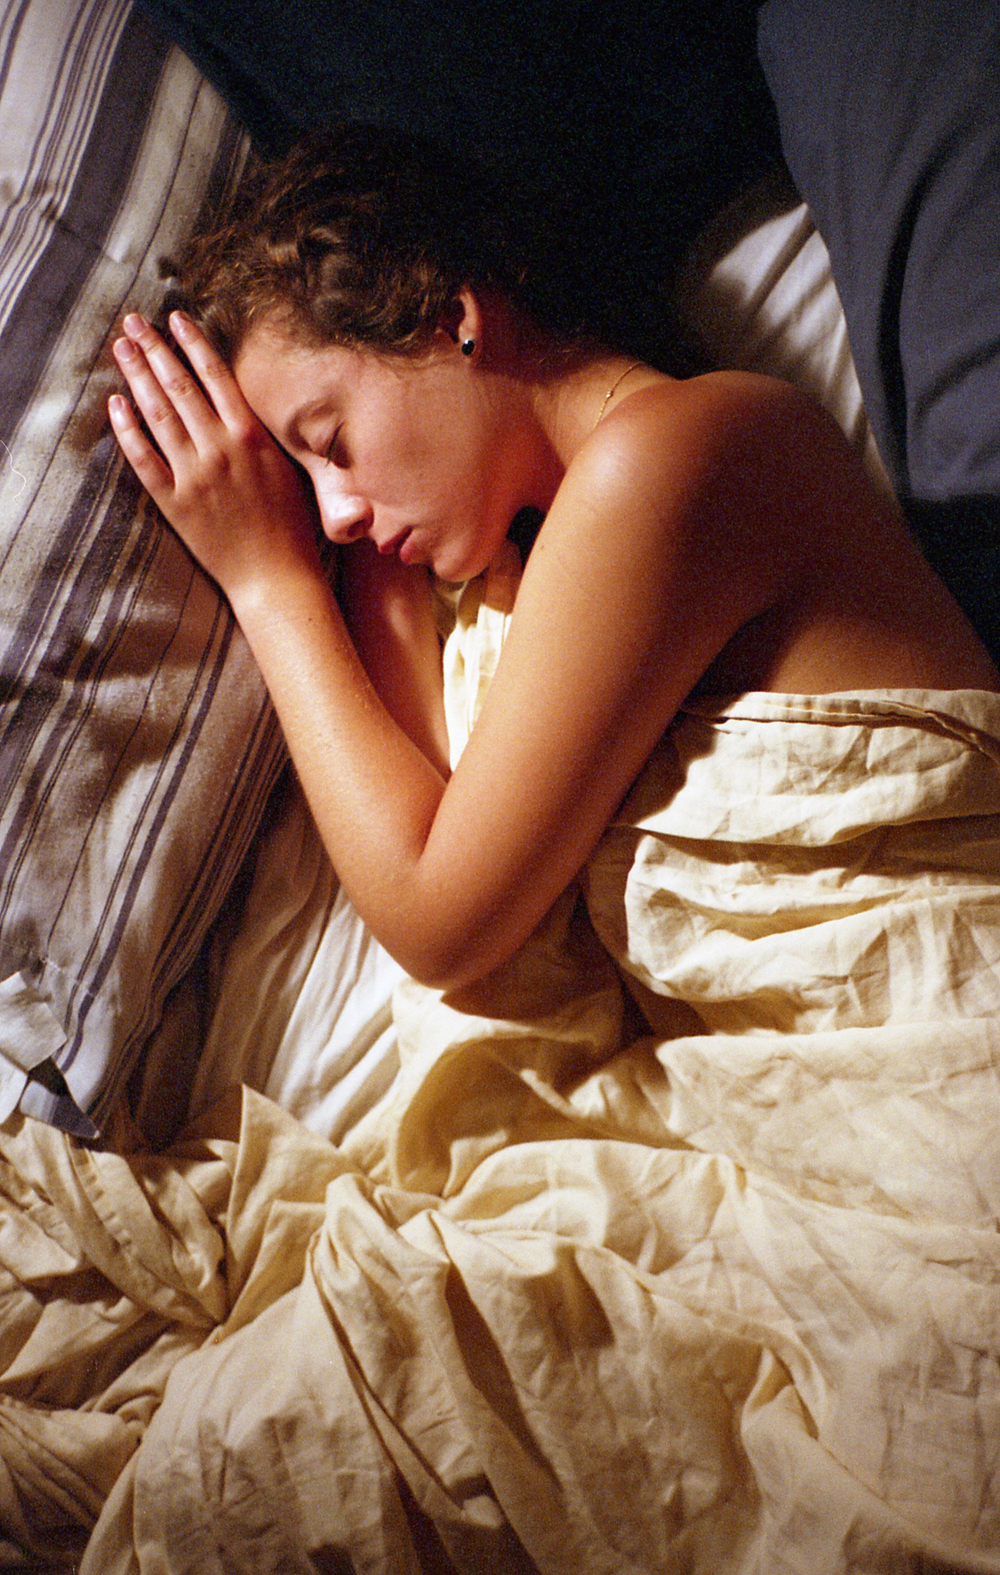 elle_asleep_contax.jpg